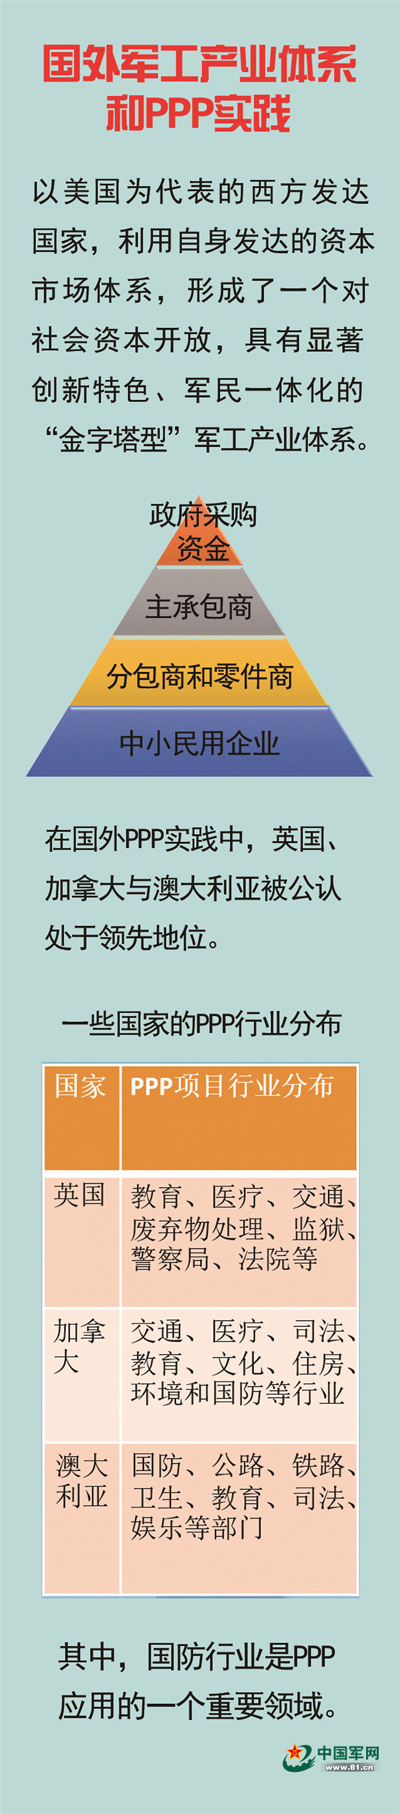 PPP模式对军民深度融合发展意味着什么?